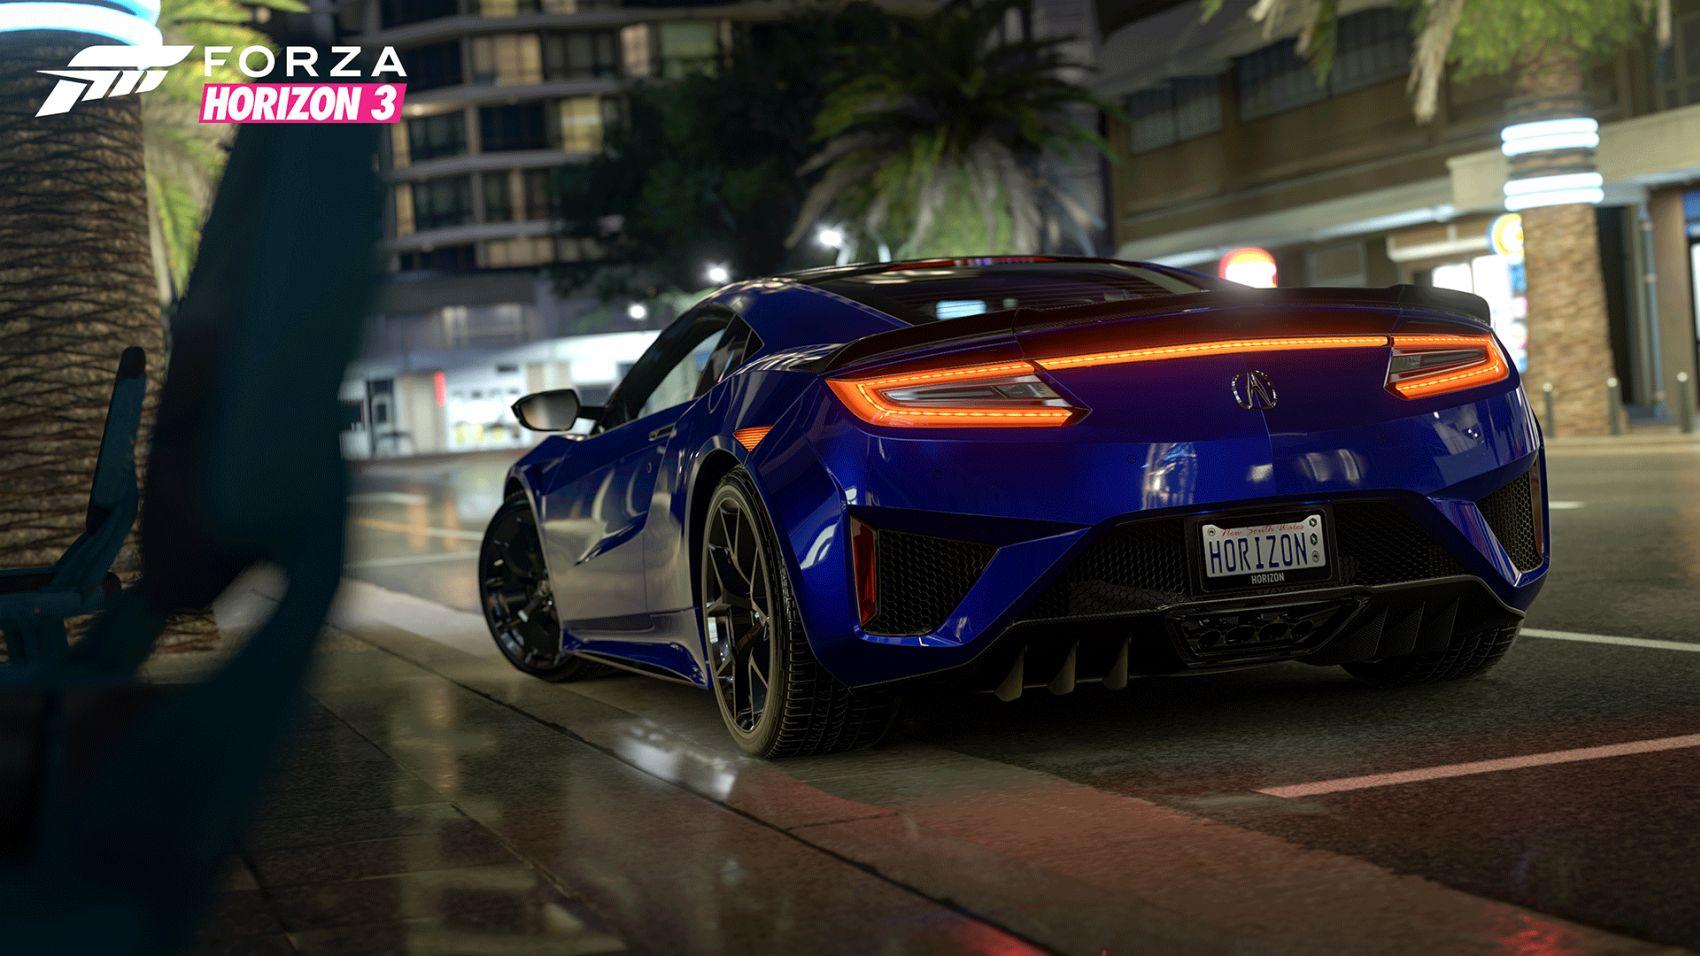 Image for Forza Horizon 3 Windows 10 demo finally released